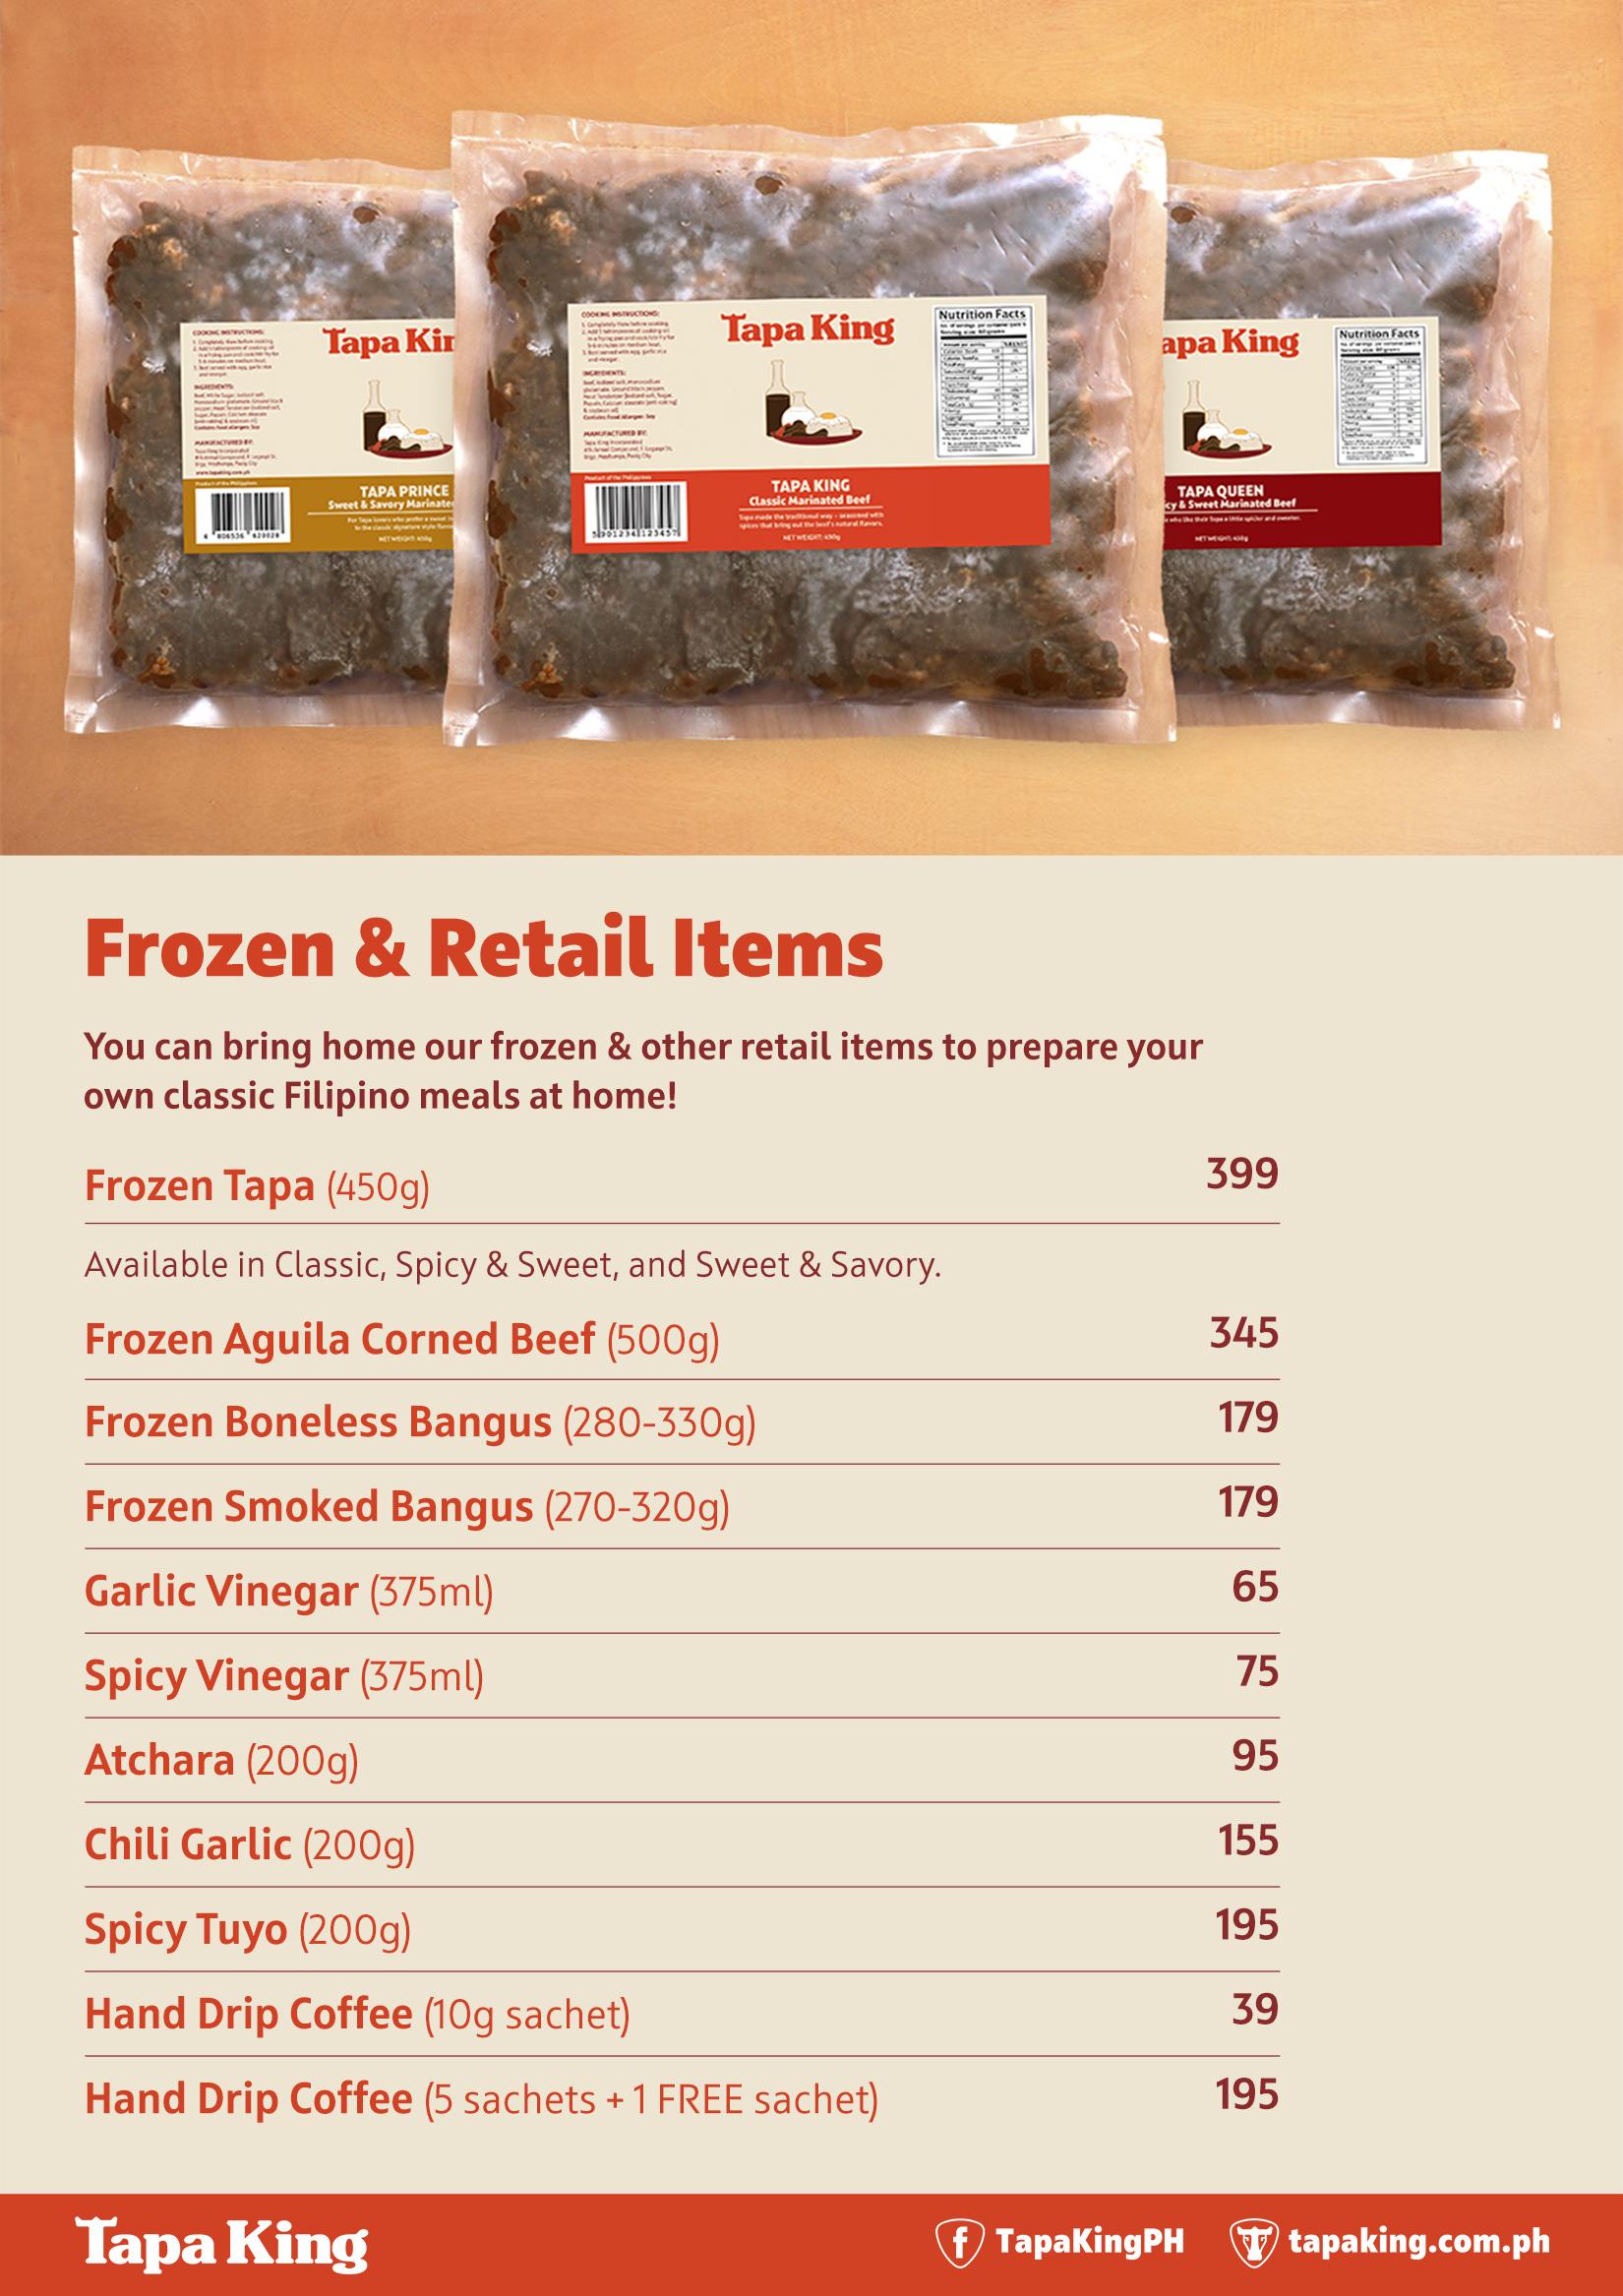 Tapa King Frozen & Retail Items